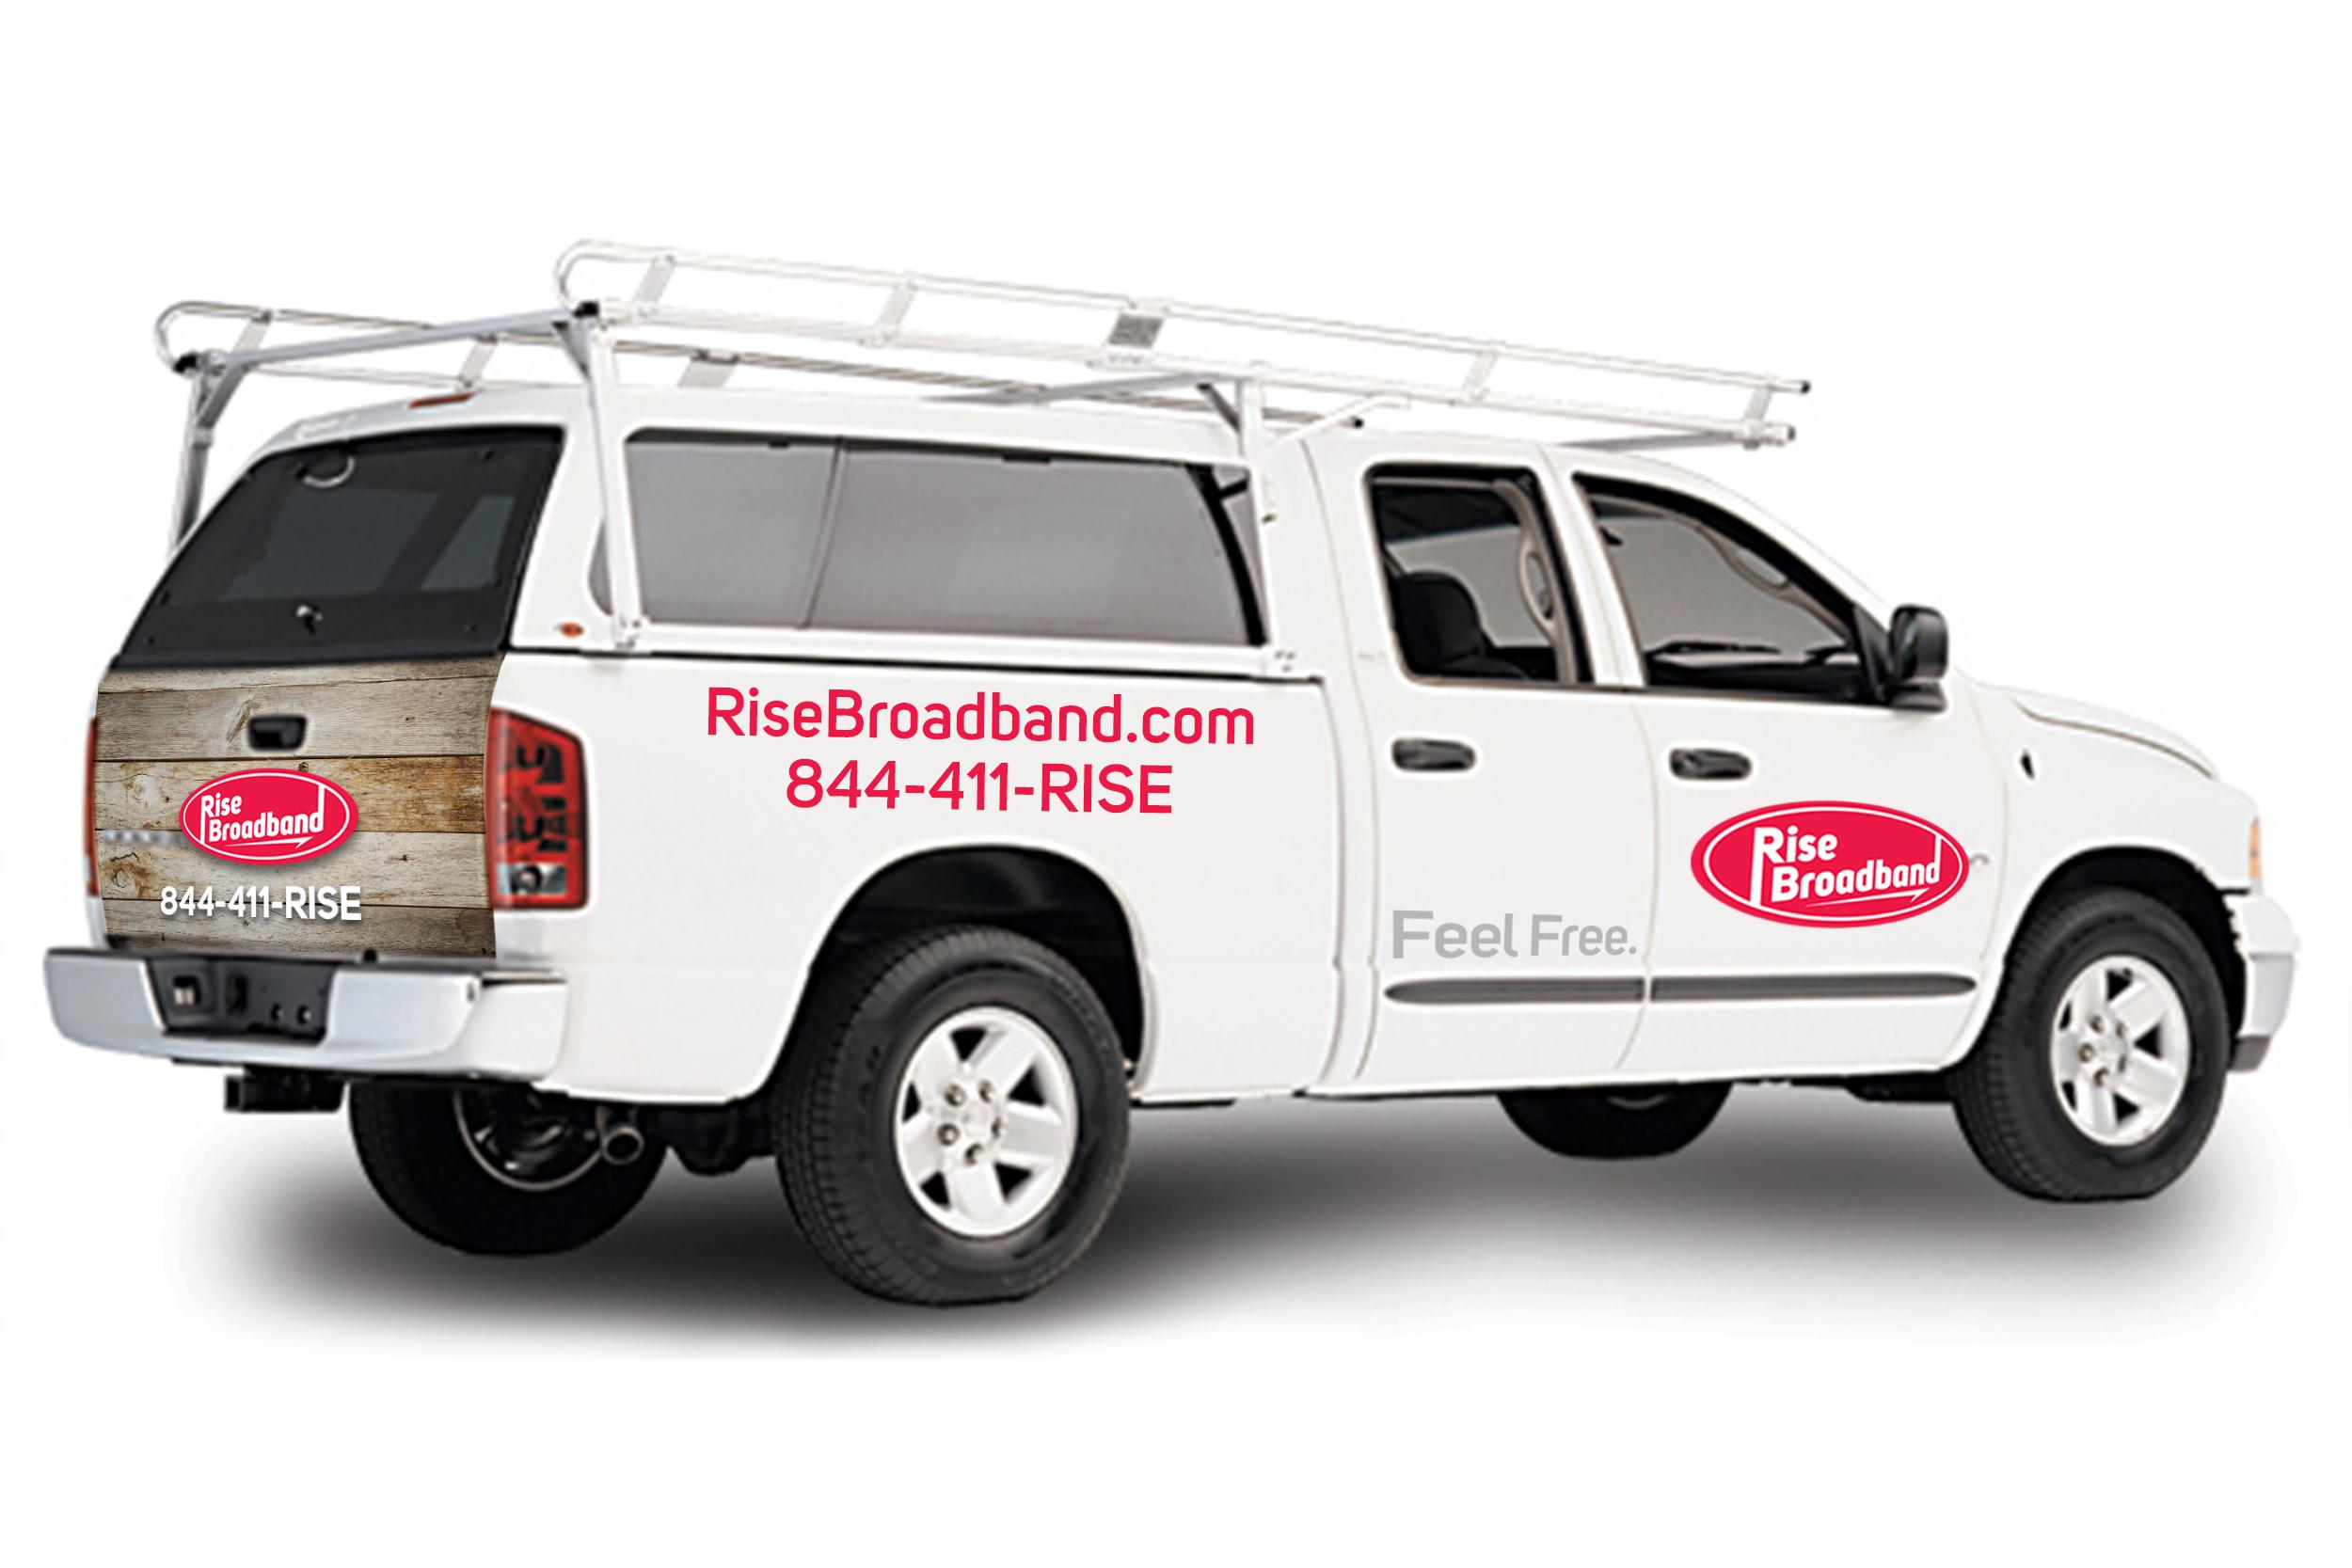 Rise Broadband's new tech / service vehicle. (Photo: Business Wire)